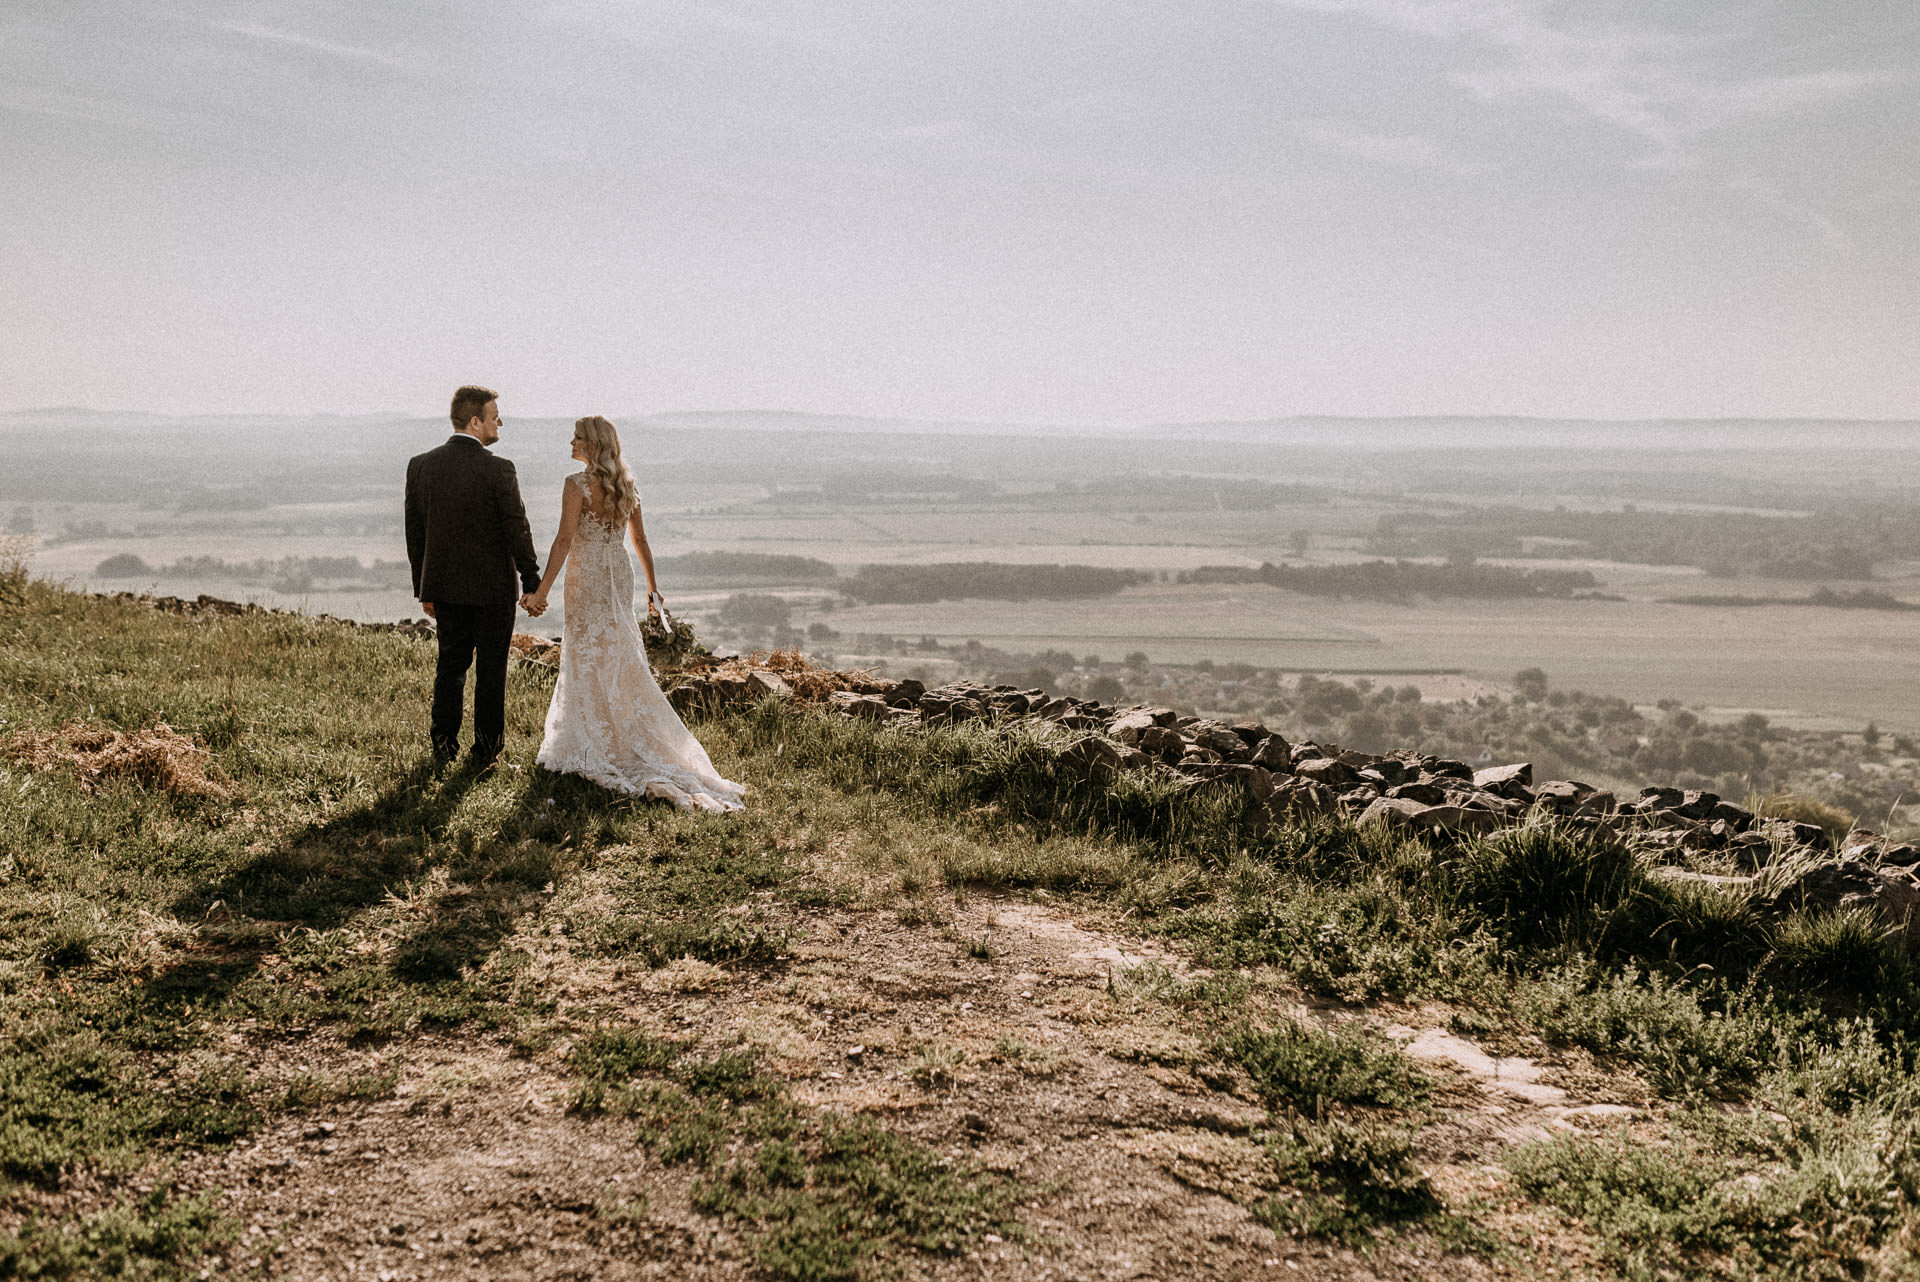 bride groom somlo hill holding hands kezen fogva volegeny menyasszony